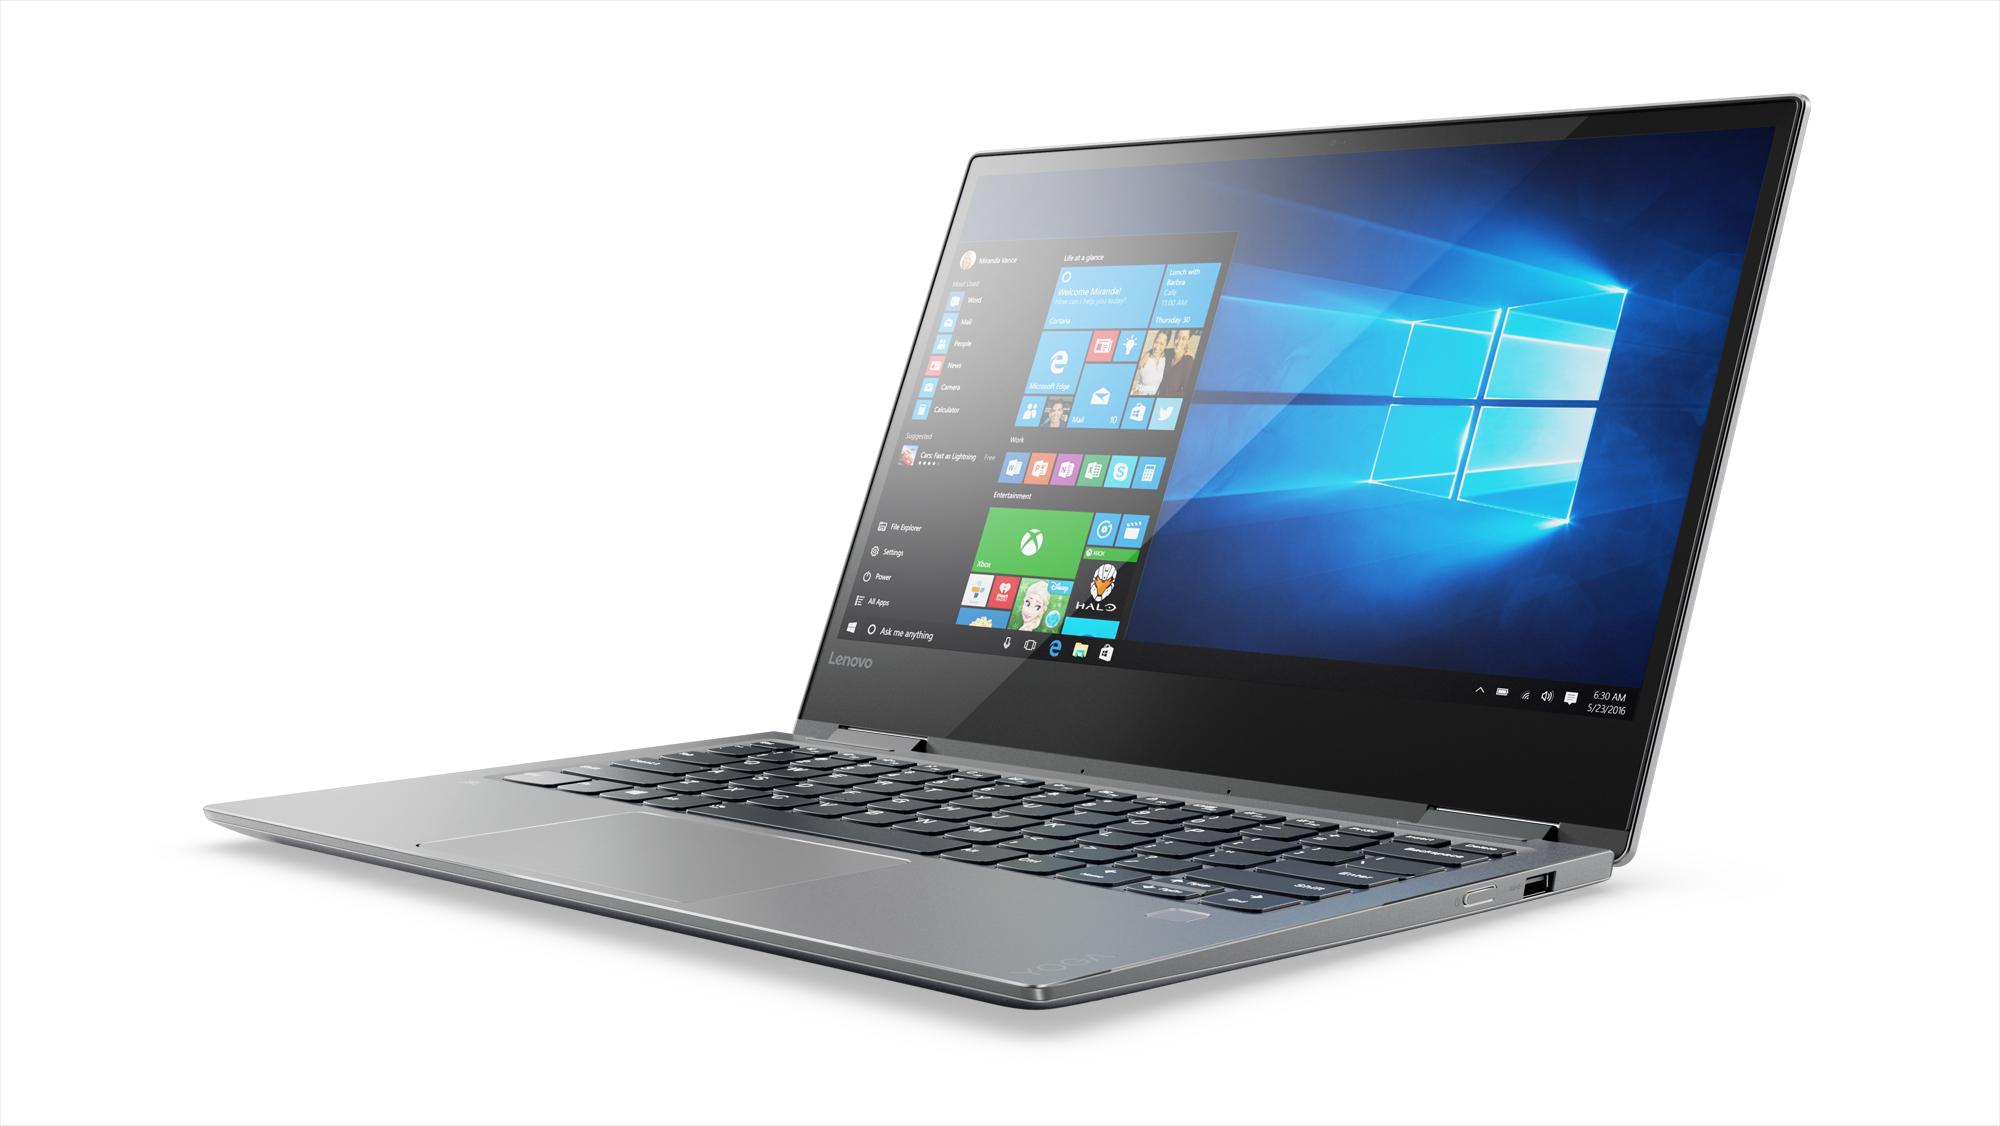 Фото  Ультрабук Lenovo Yoga 720 Iron Grey (81C300A2RA)